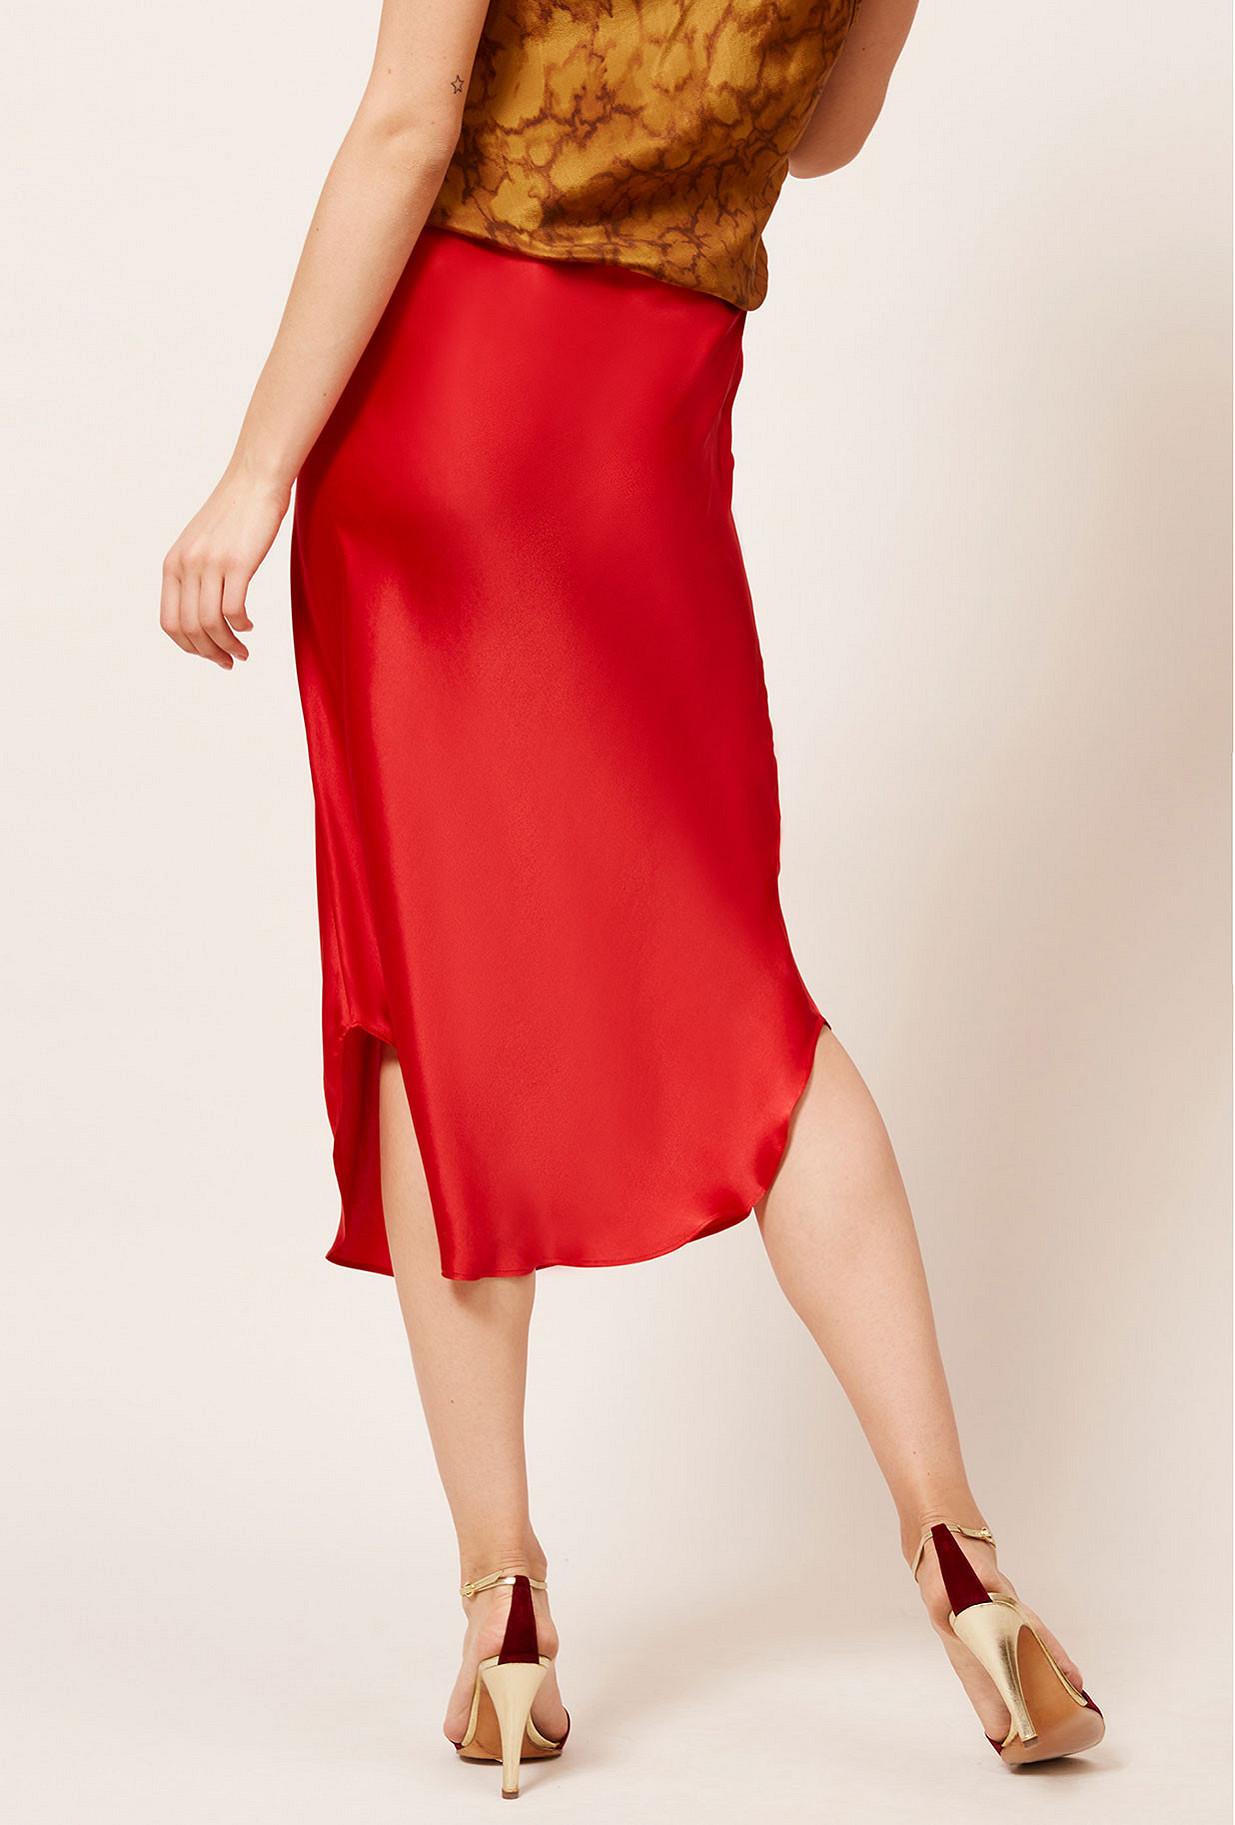 Paris clothes store Skirt  Nami french designer fashion Paris